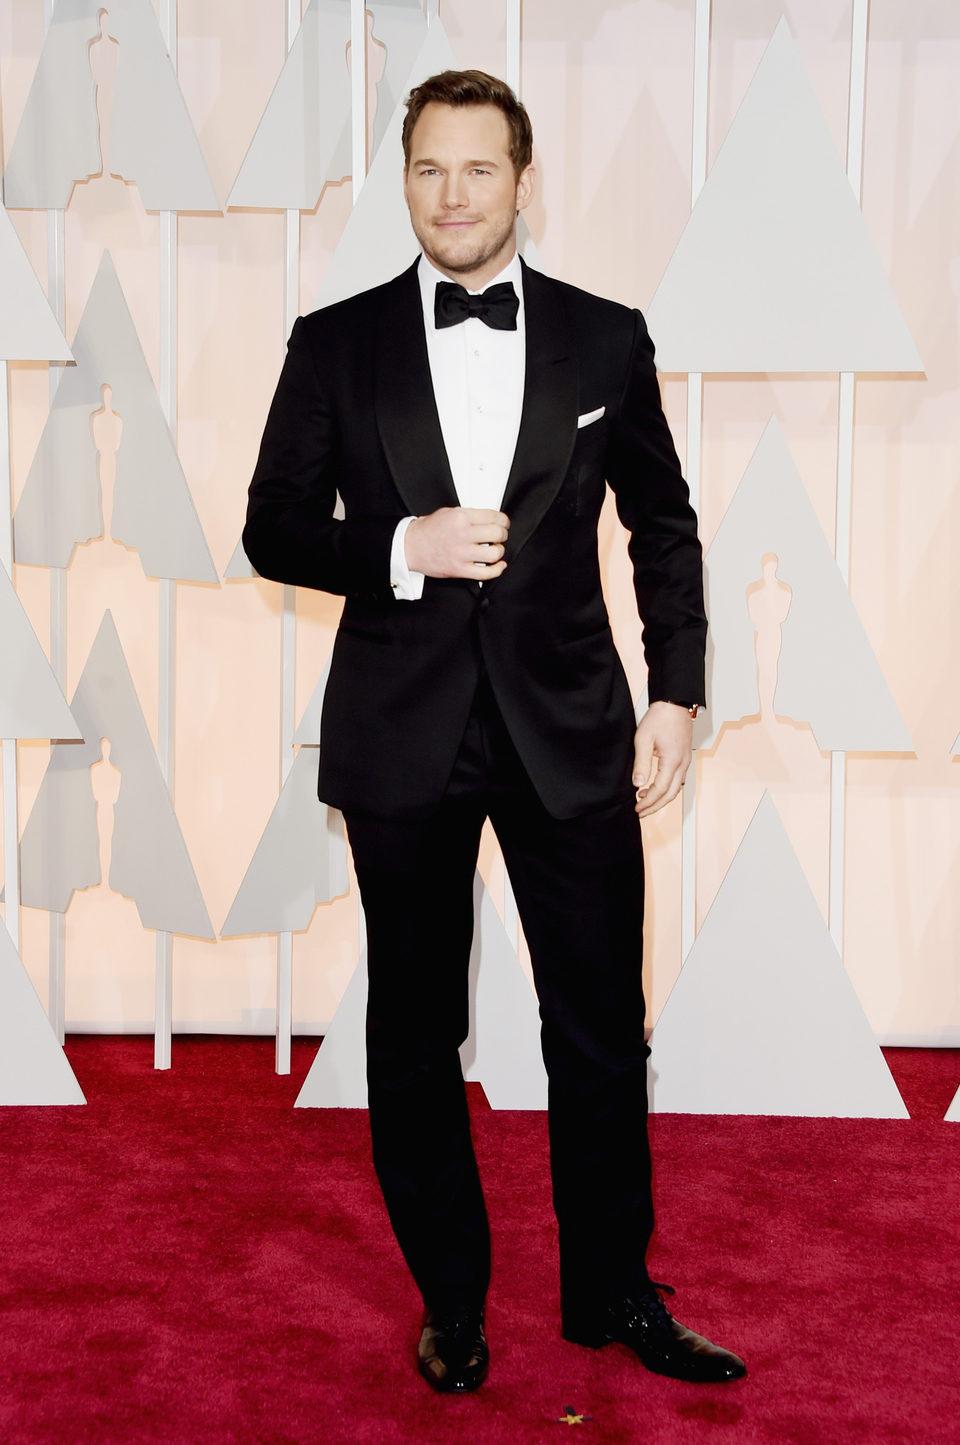 Chris Pratt at the Oscar 2015 red carpet